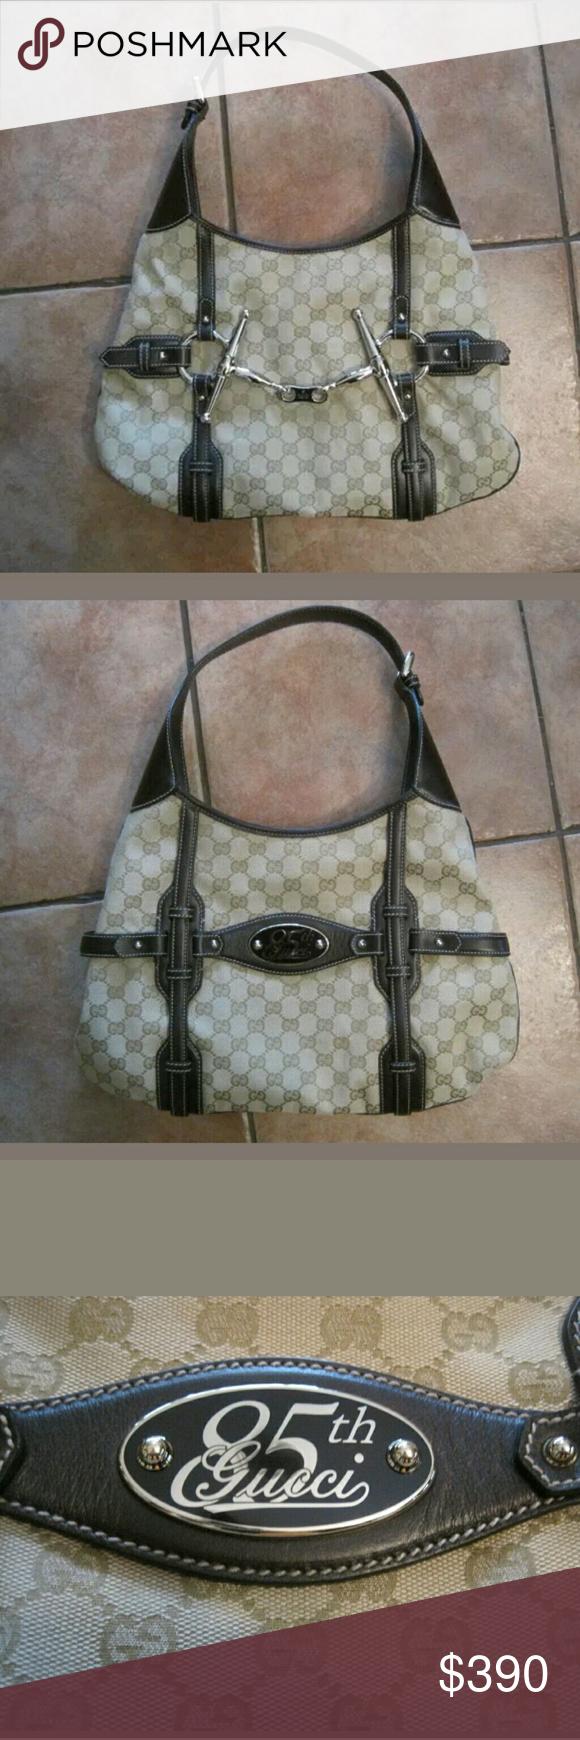 ce61cf1cd6d8 GUCCI HORSEBIT 85TH ANNIVERSARY HANDBAG Beautiful! In brand new condition ~ Gucci  Horsebit Hobo Handbag